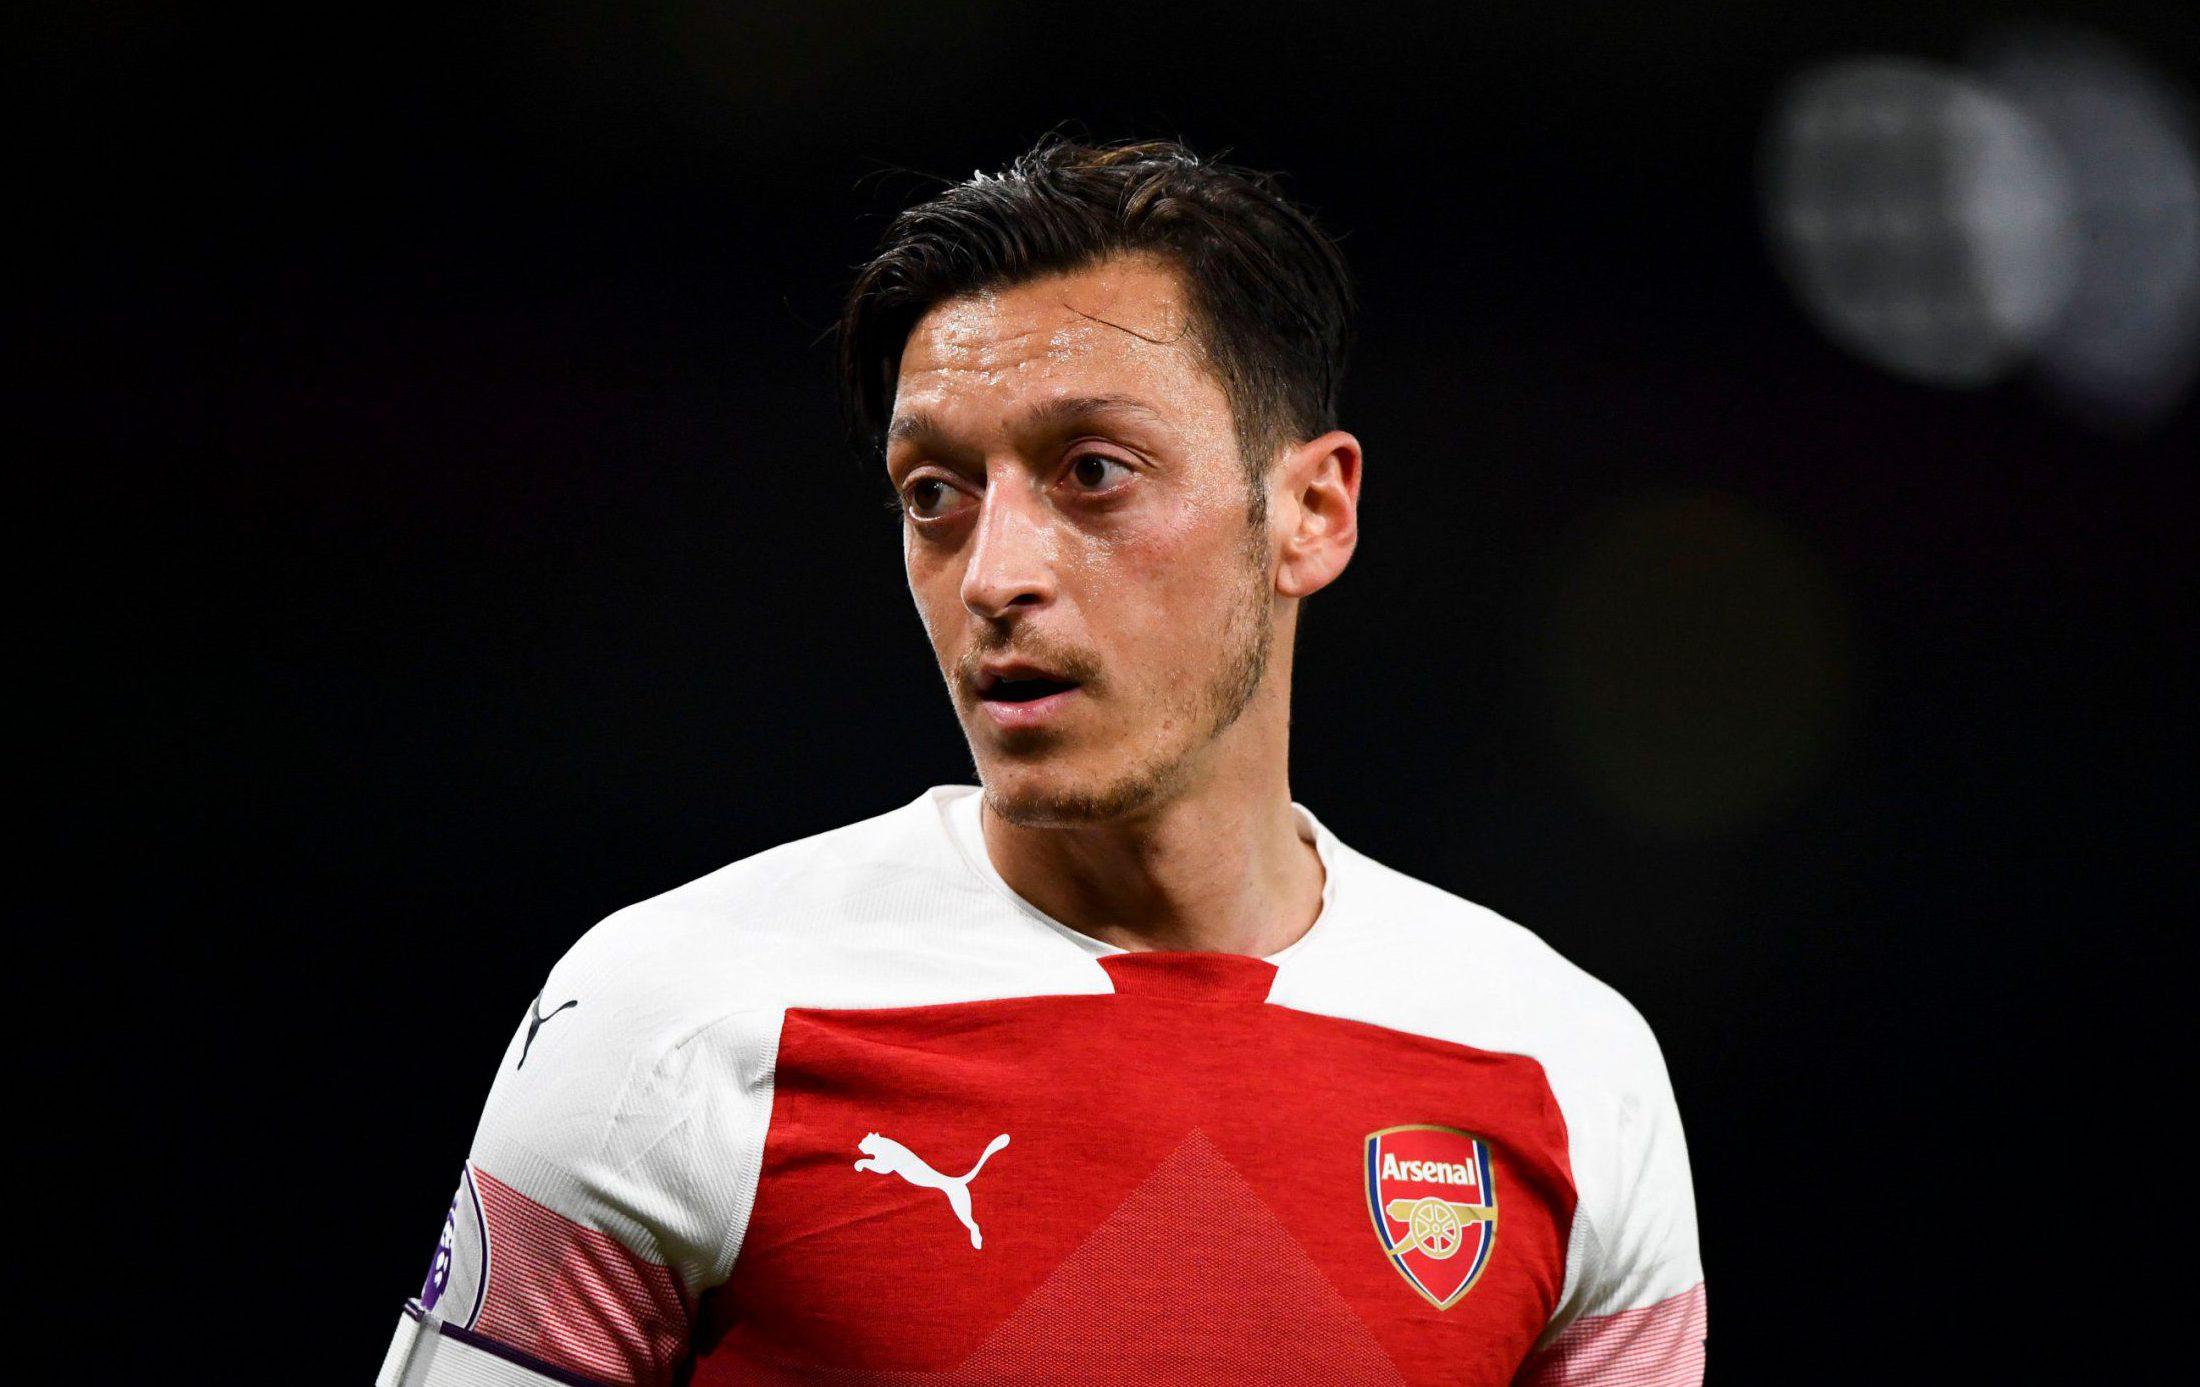 Mesut Ozil calls Matteo Guendouzi the best young player at Arsenal